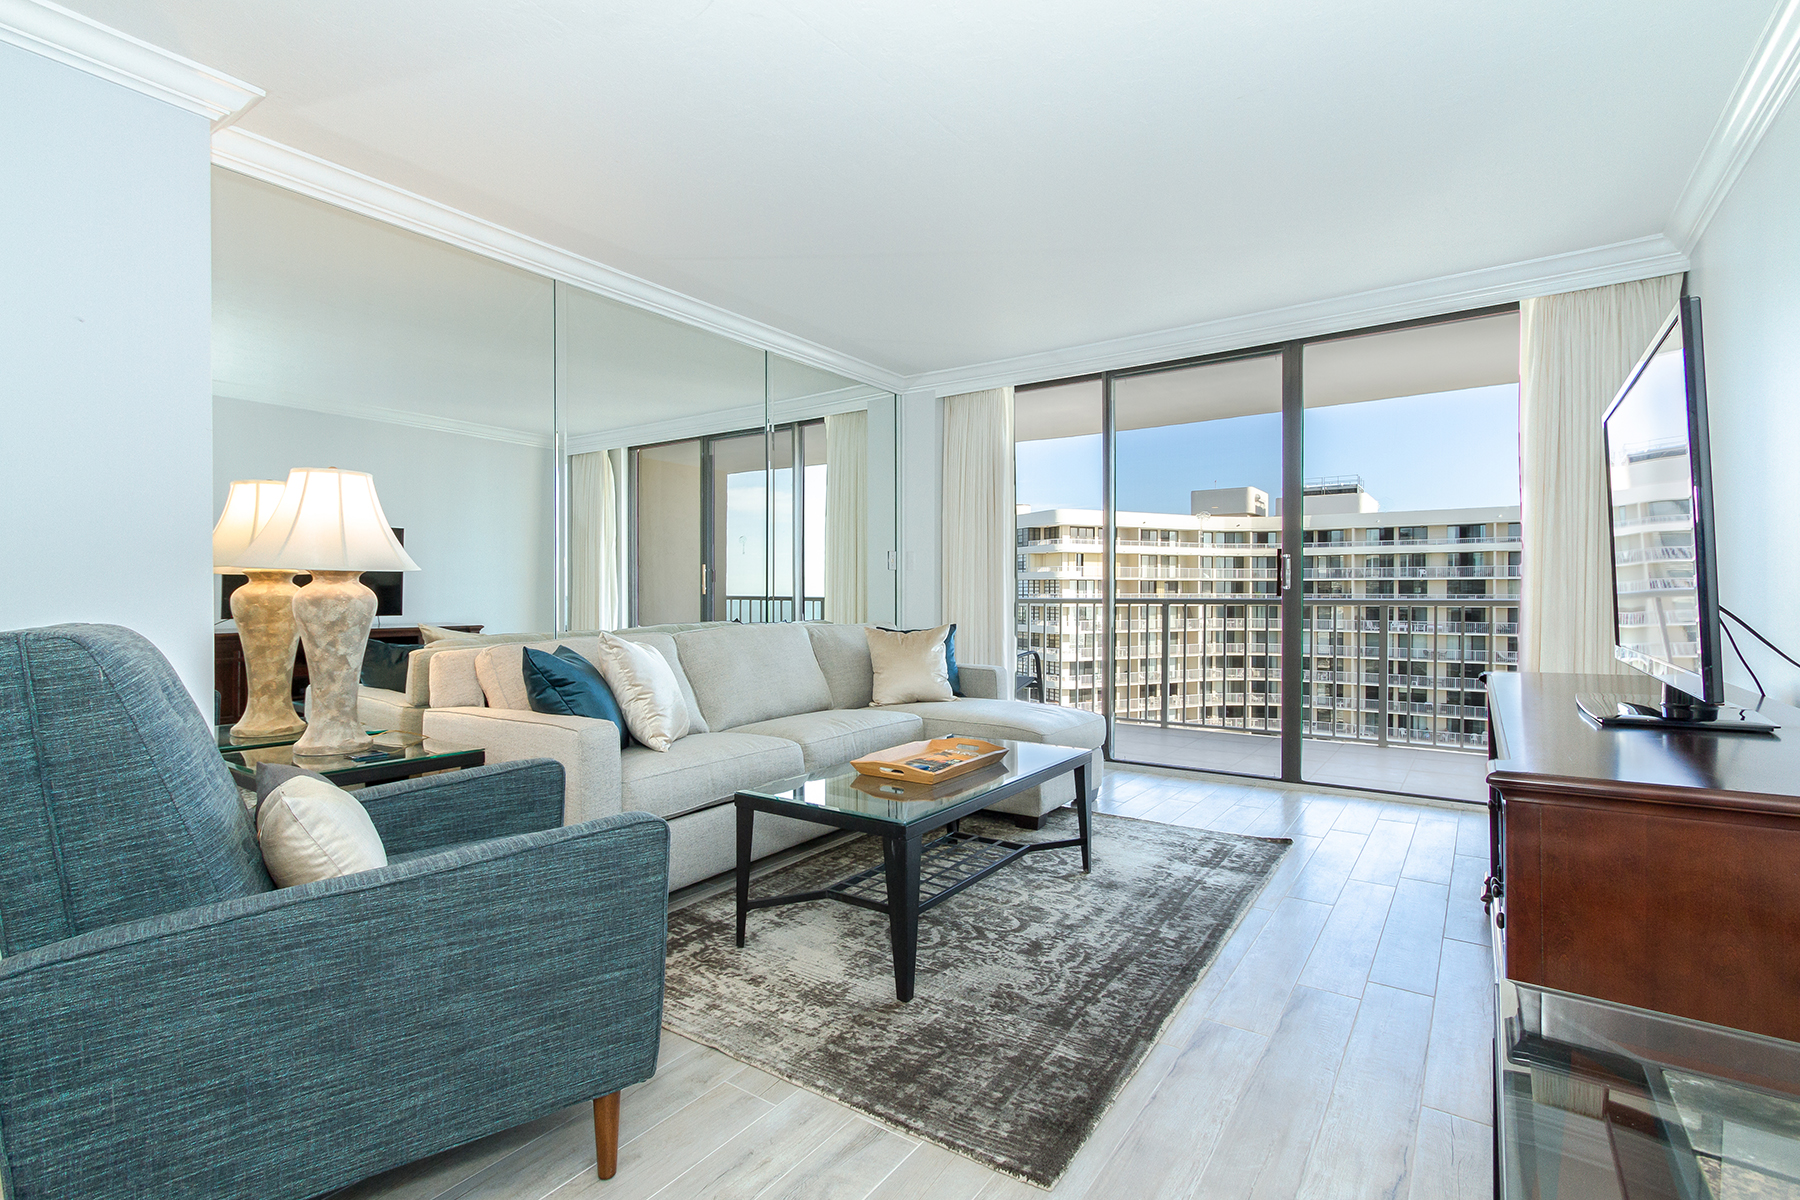 Condominium for Rent at SOUTH SEAS - SOUTH SEAS NORTHWEST 440 Seaview Ct 1709, Marco Island, Florida 34145 United States